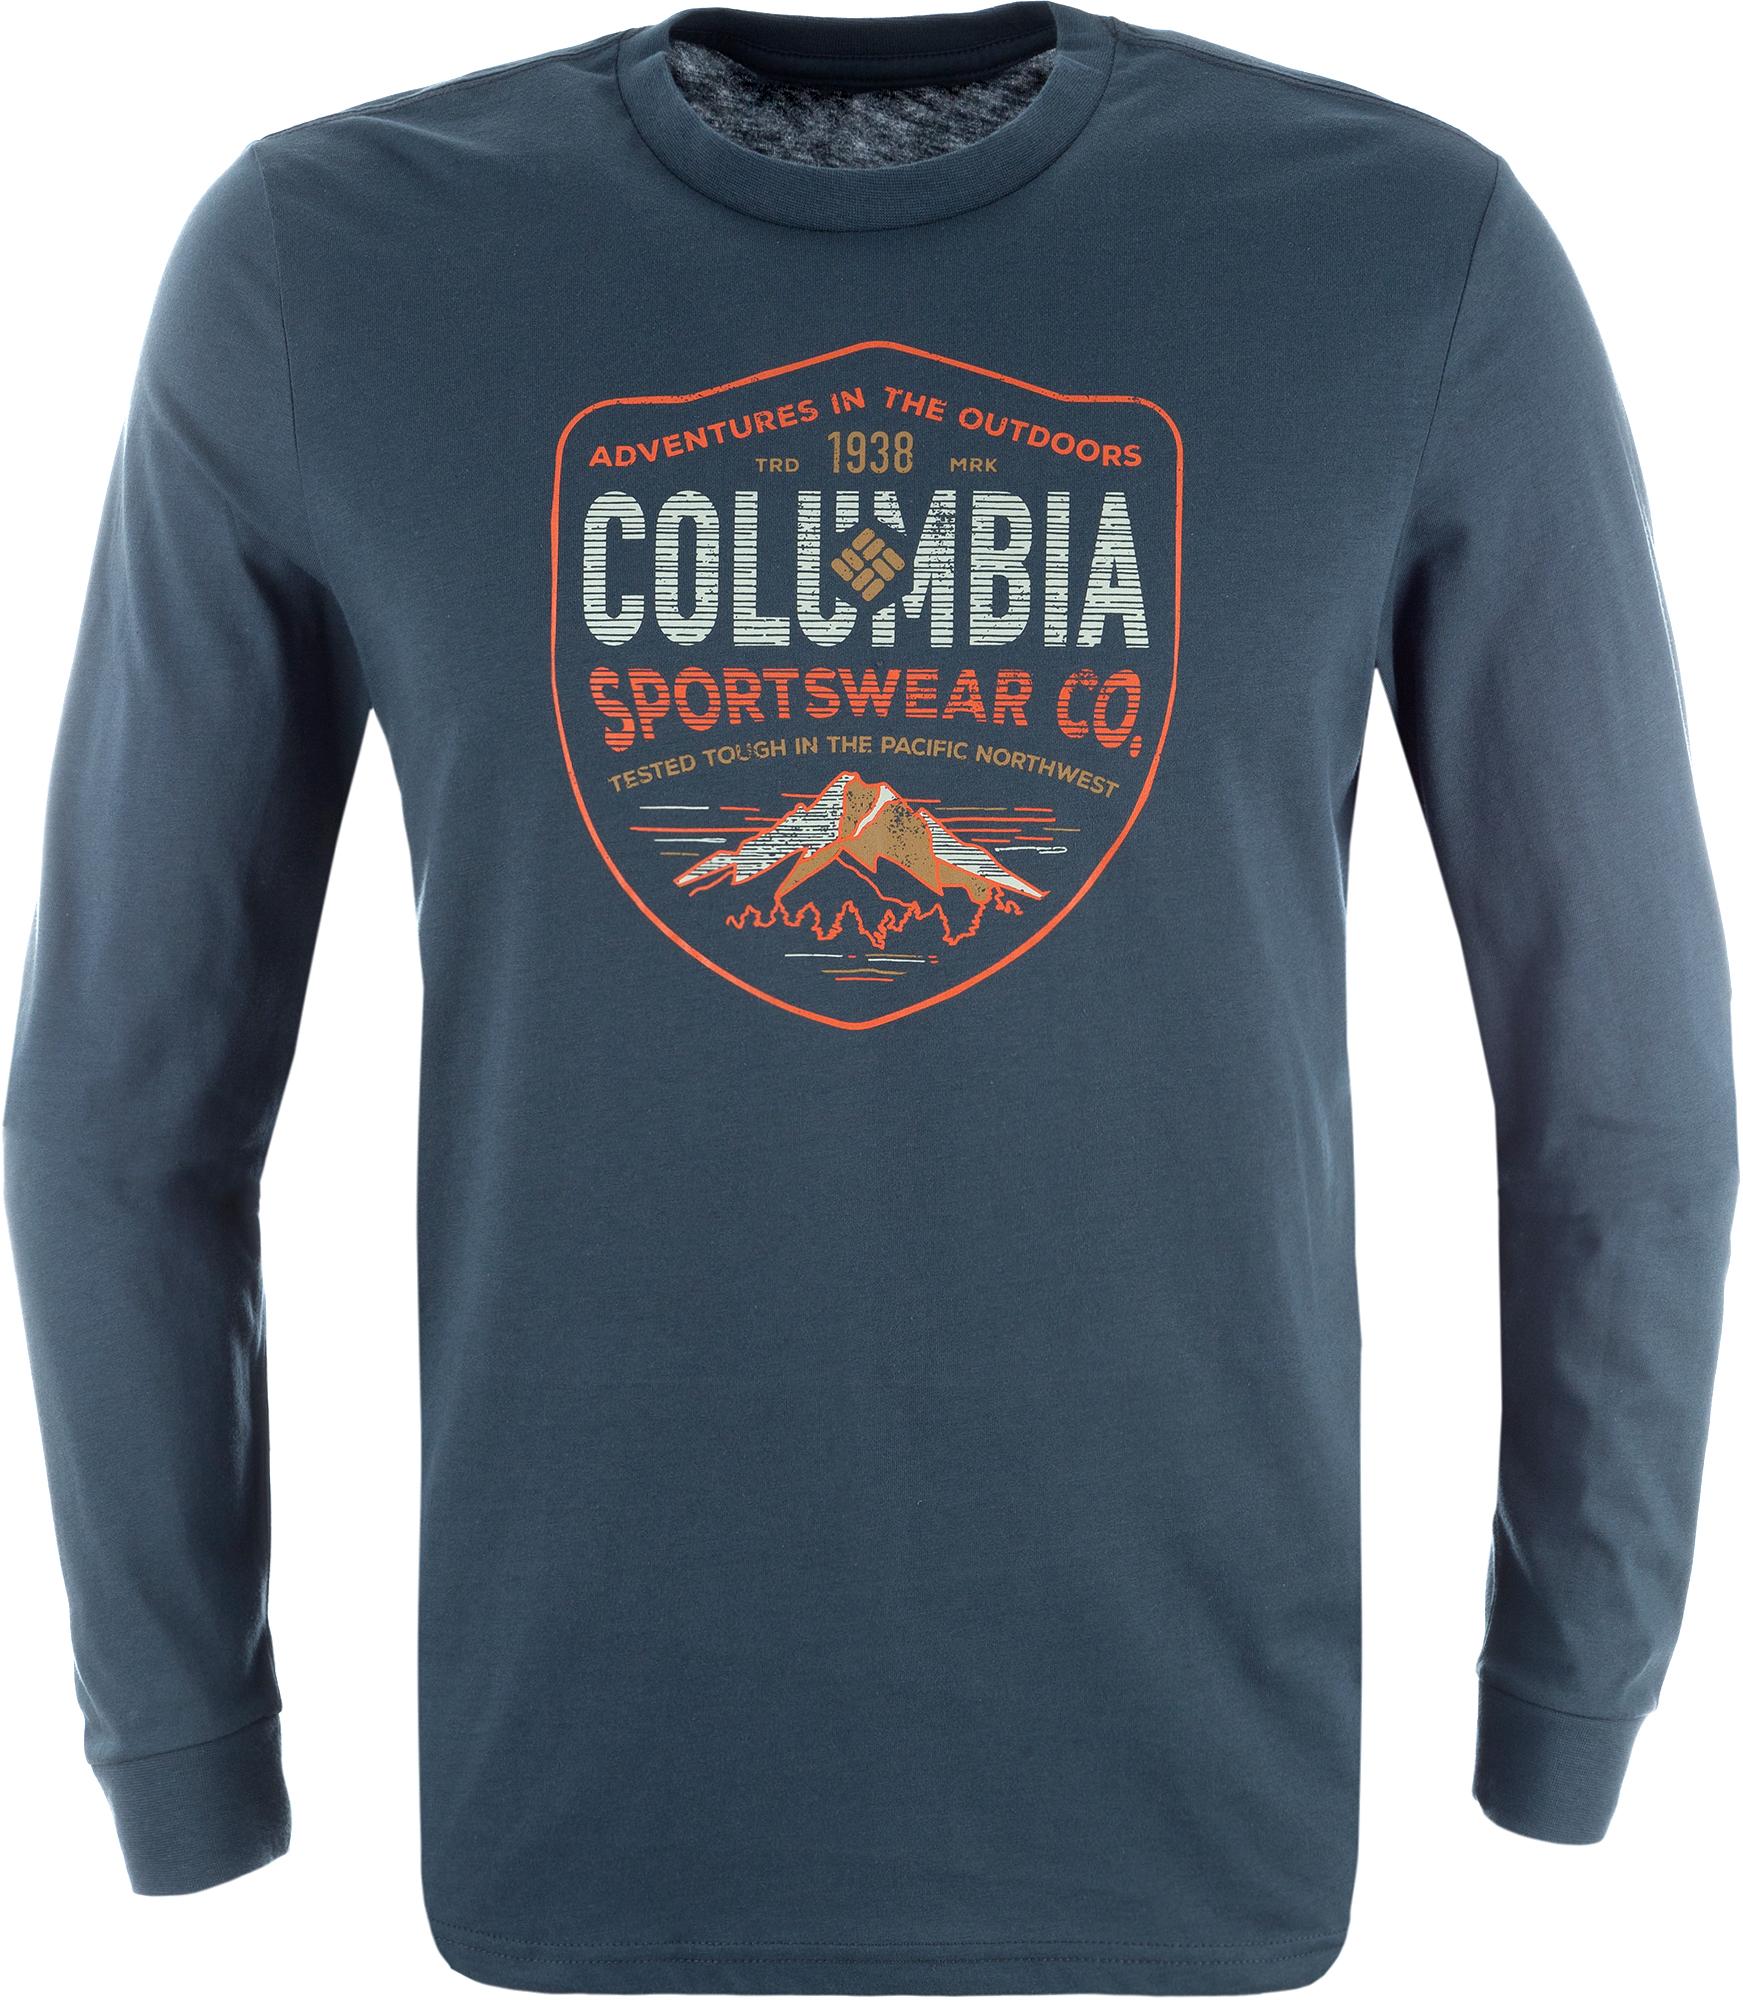 Columbia Футболка с длинным рукавом мужская Columbia Rugged Shield, размер 56-58